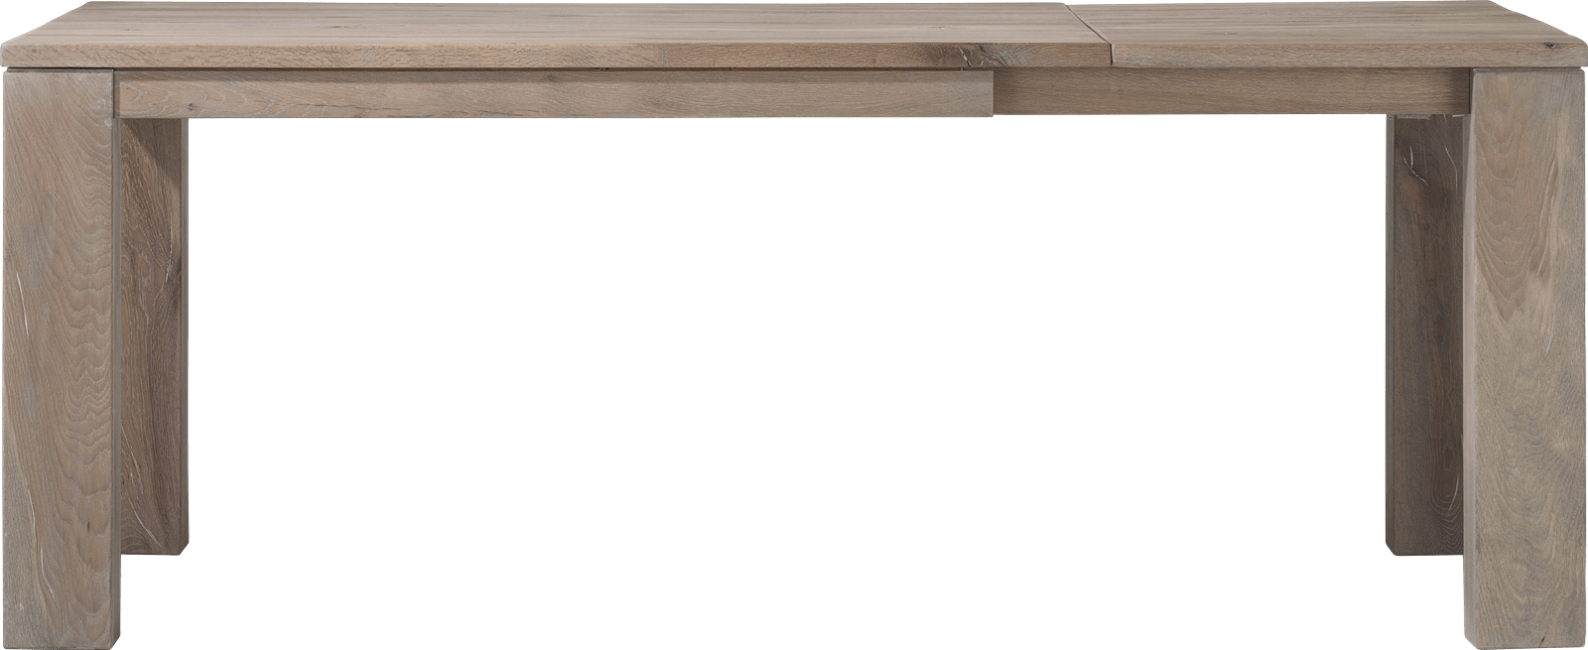 Masters - uitschuiftafel 140 (+60) x 90 cm - hout 12x12/10x14